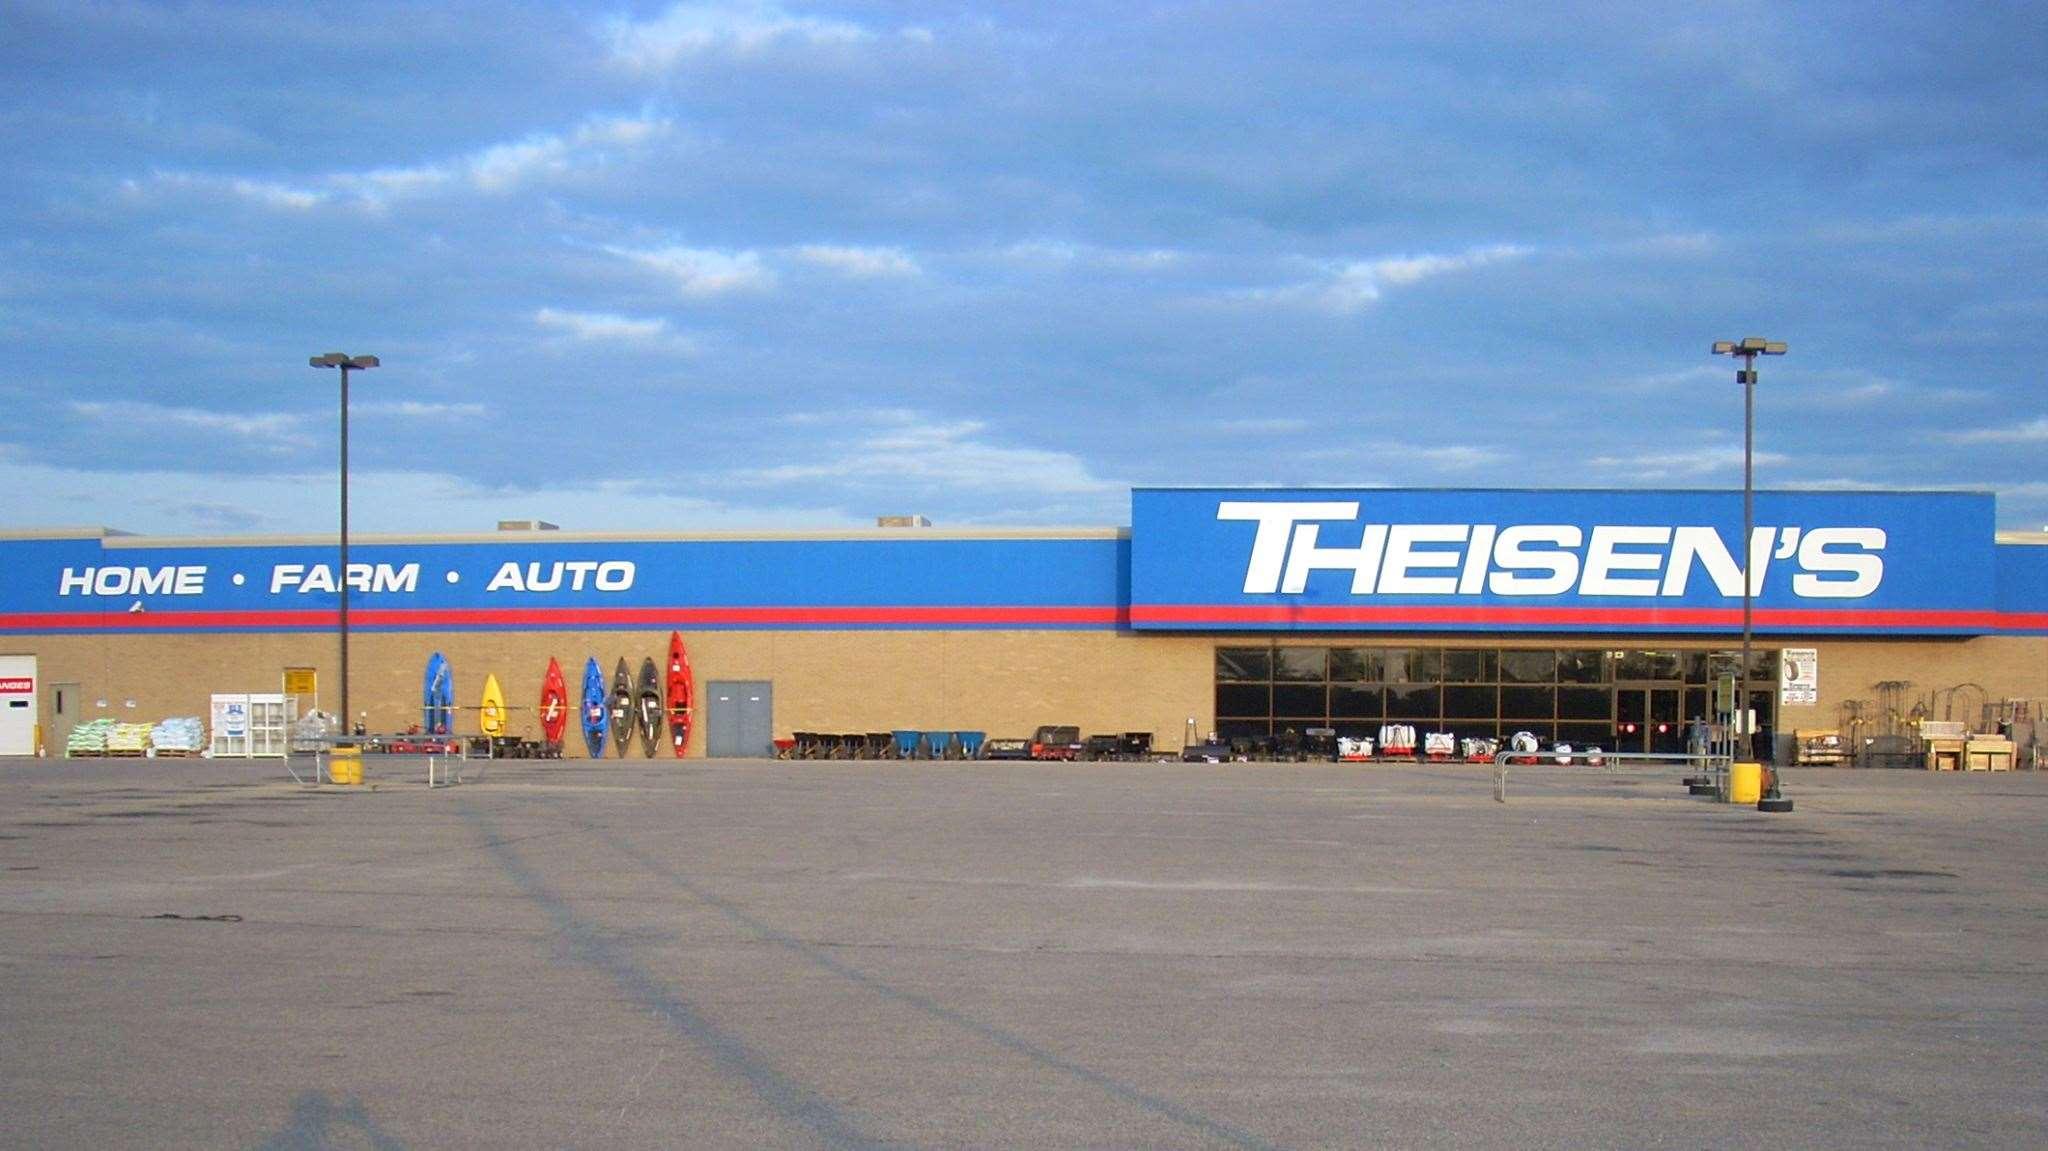 Theisen's